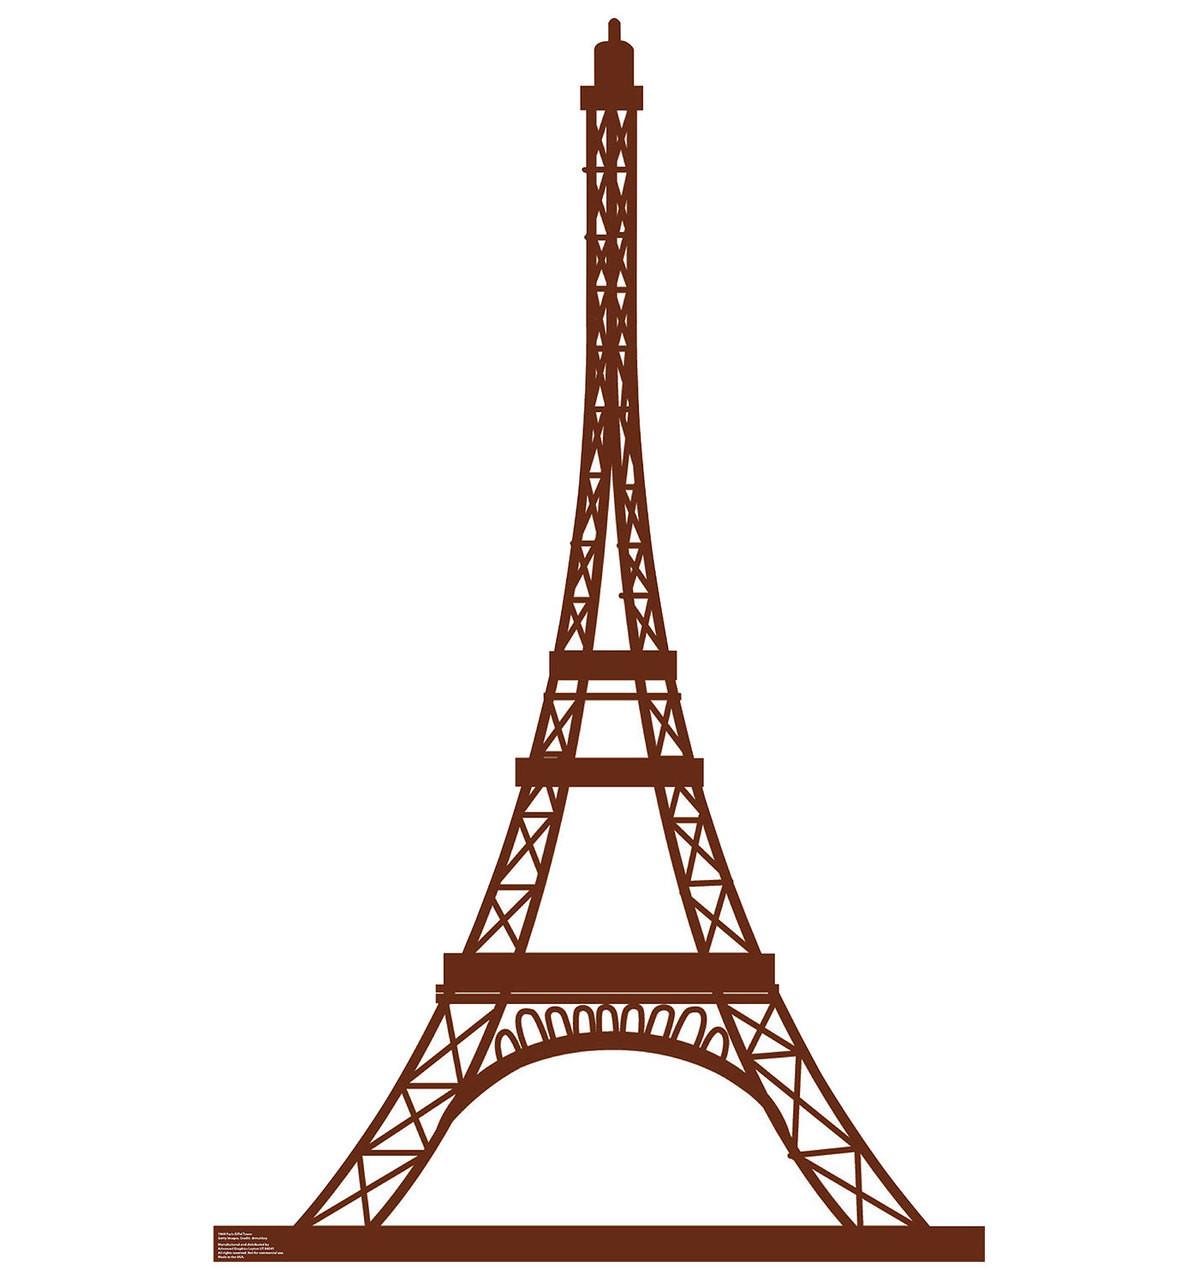 Life-size Paris Eiffel Tower Cardboard Standup | Cardboard Cutout